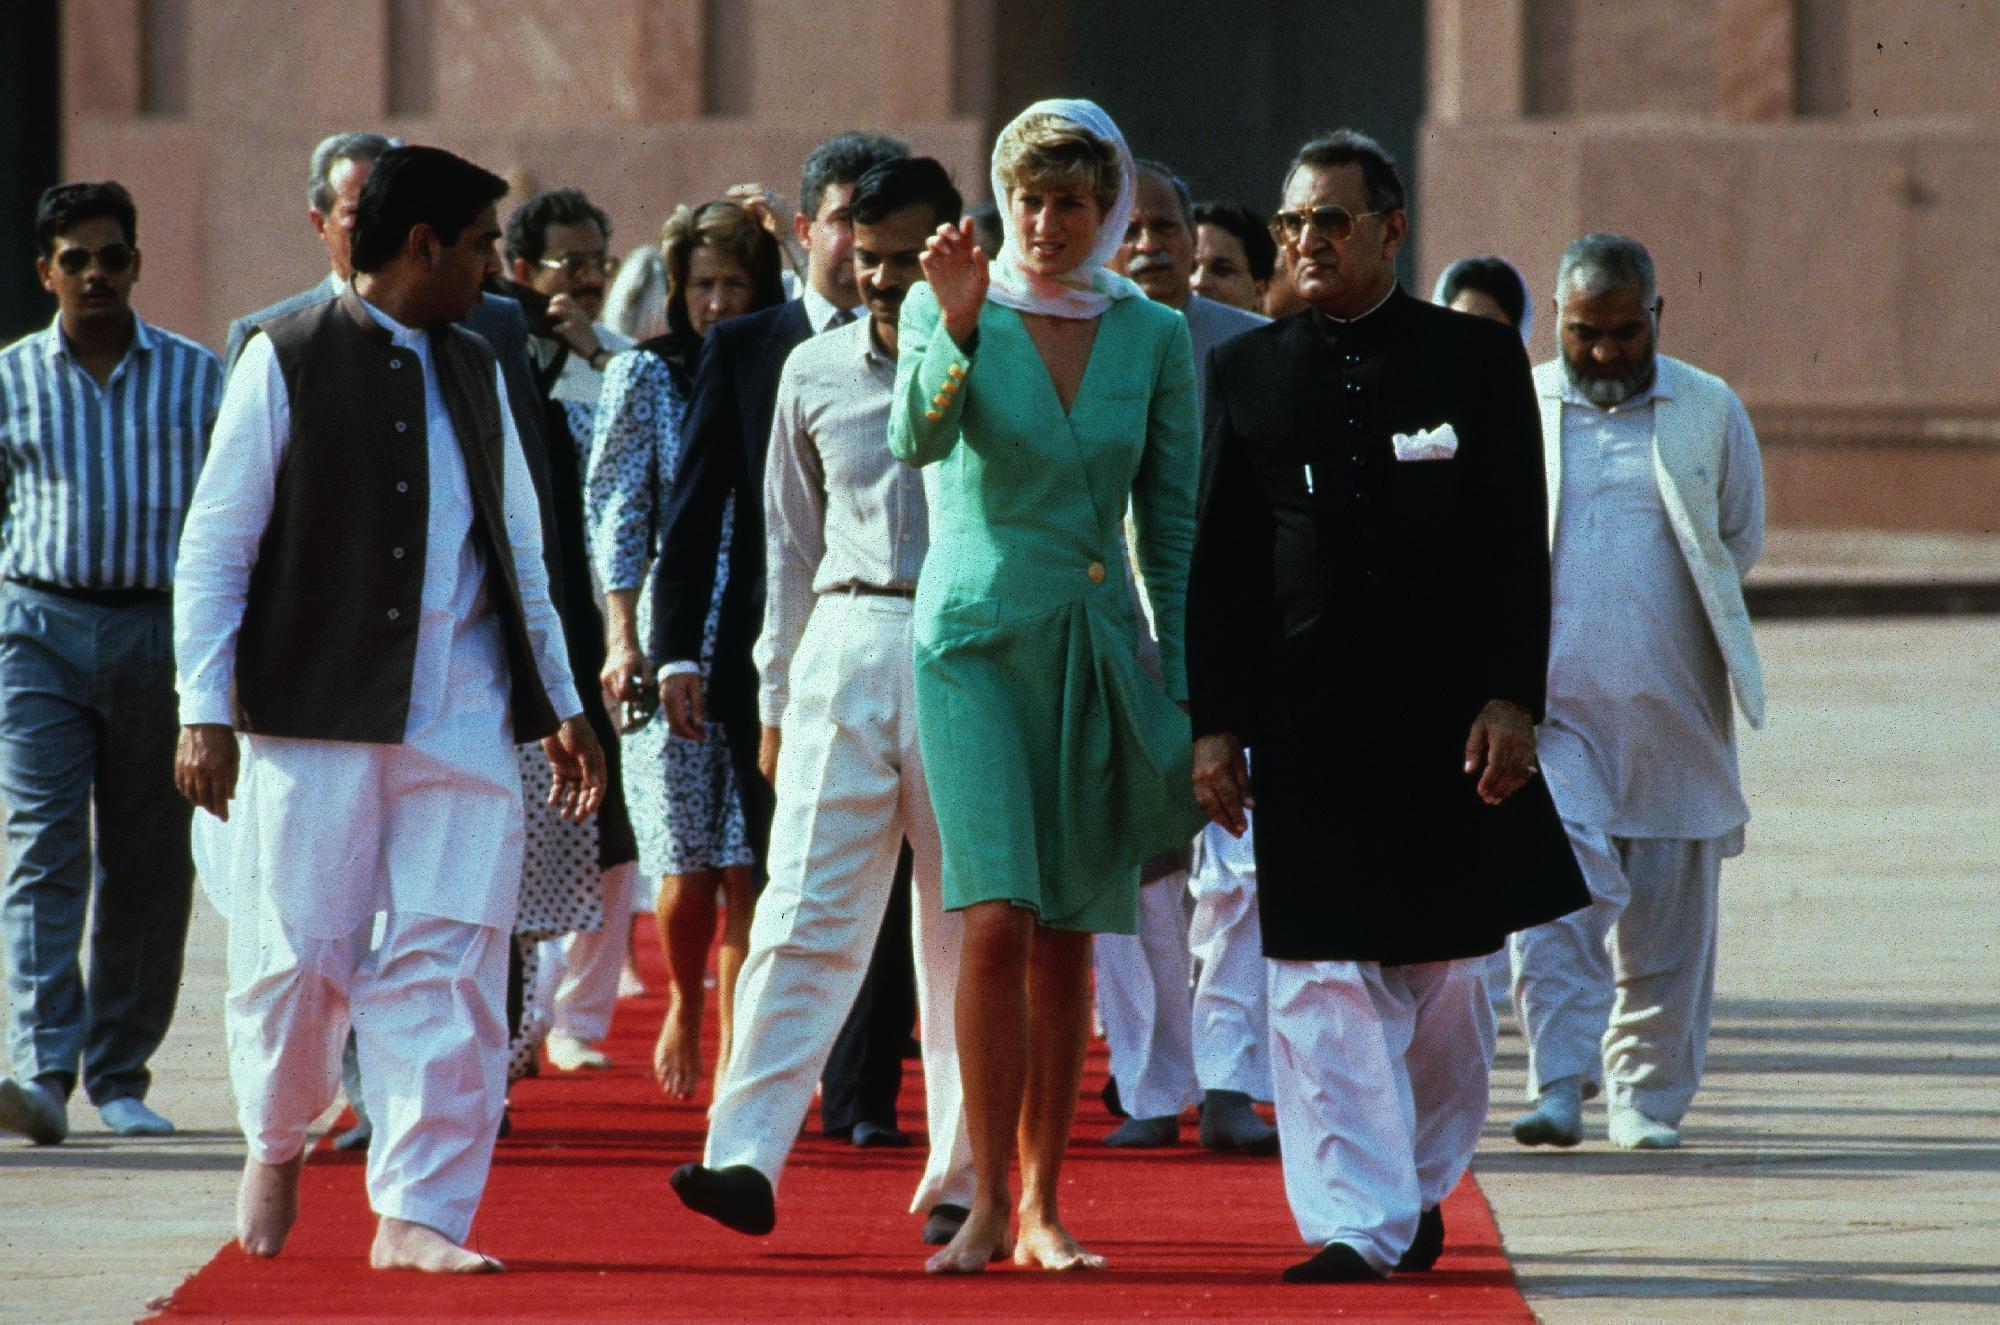 https://pics.wikifeet.com/Princess-Diana-Feet-2694702.jpg